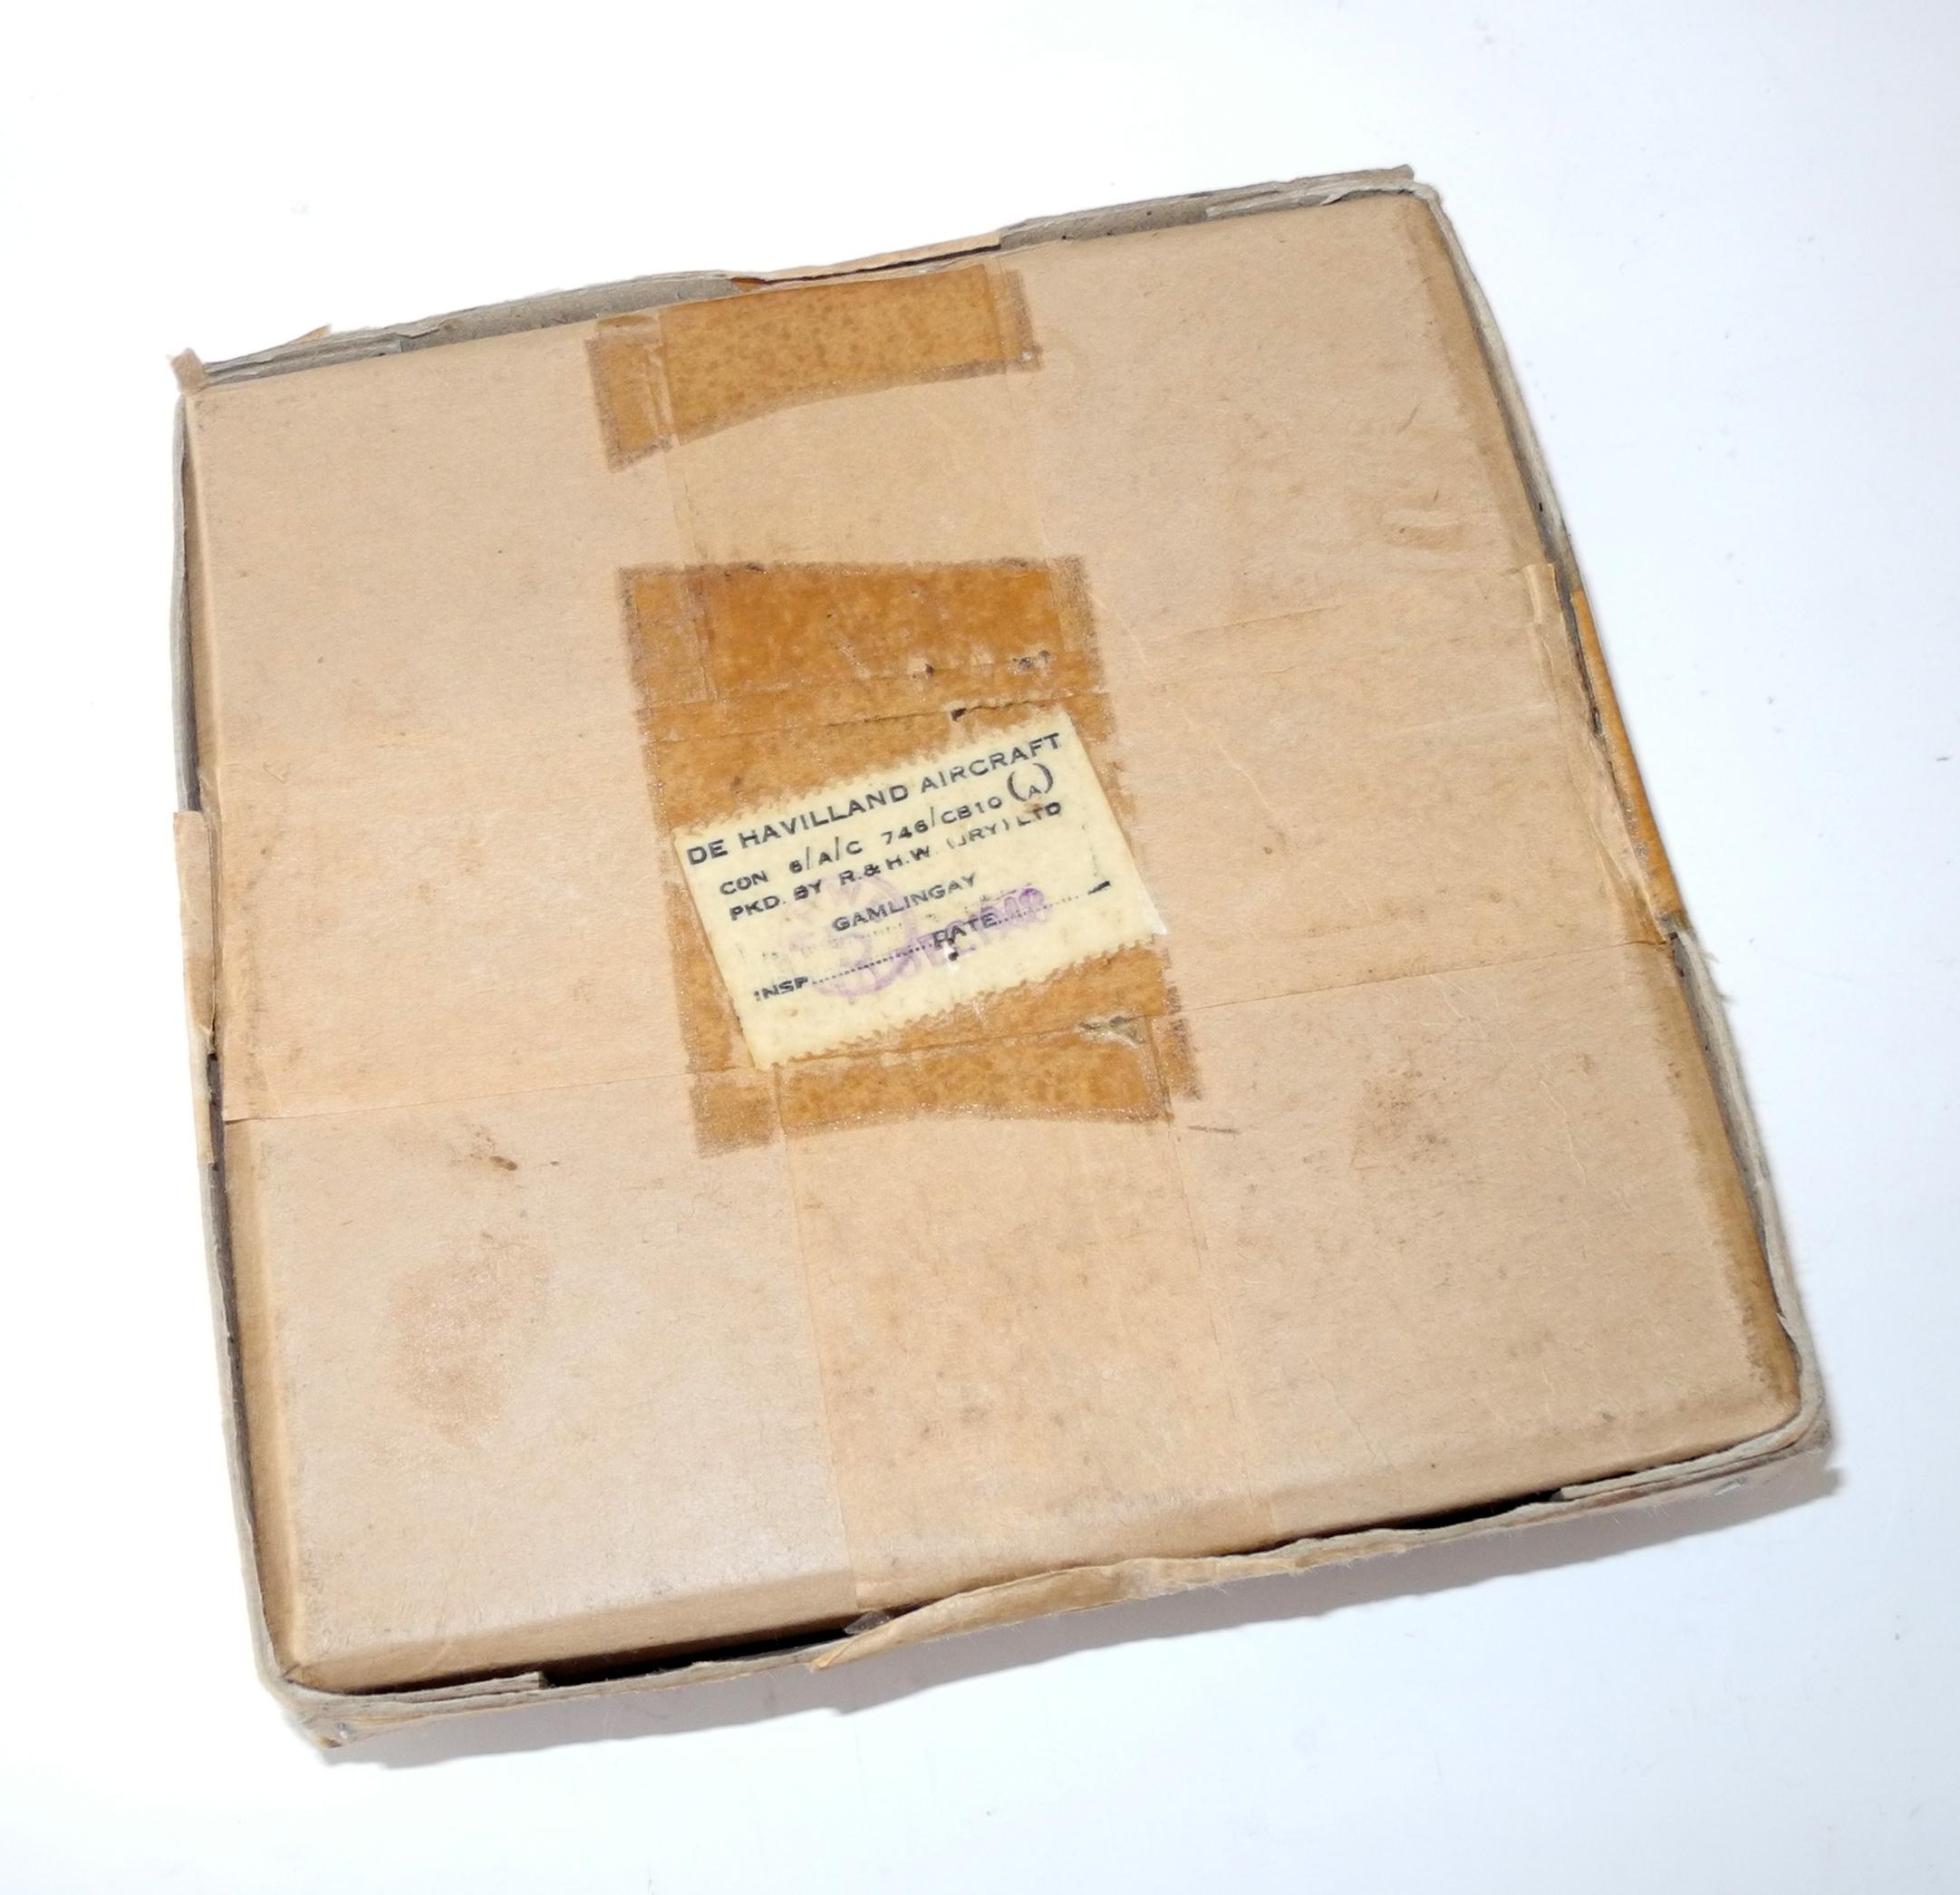 Original WWII period storage/transit boxes for RAF equipment.